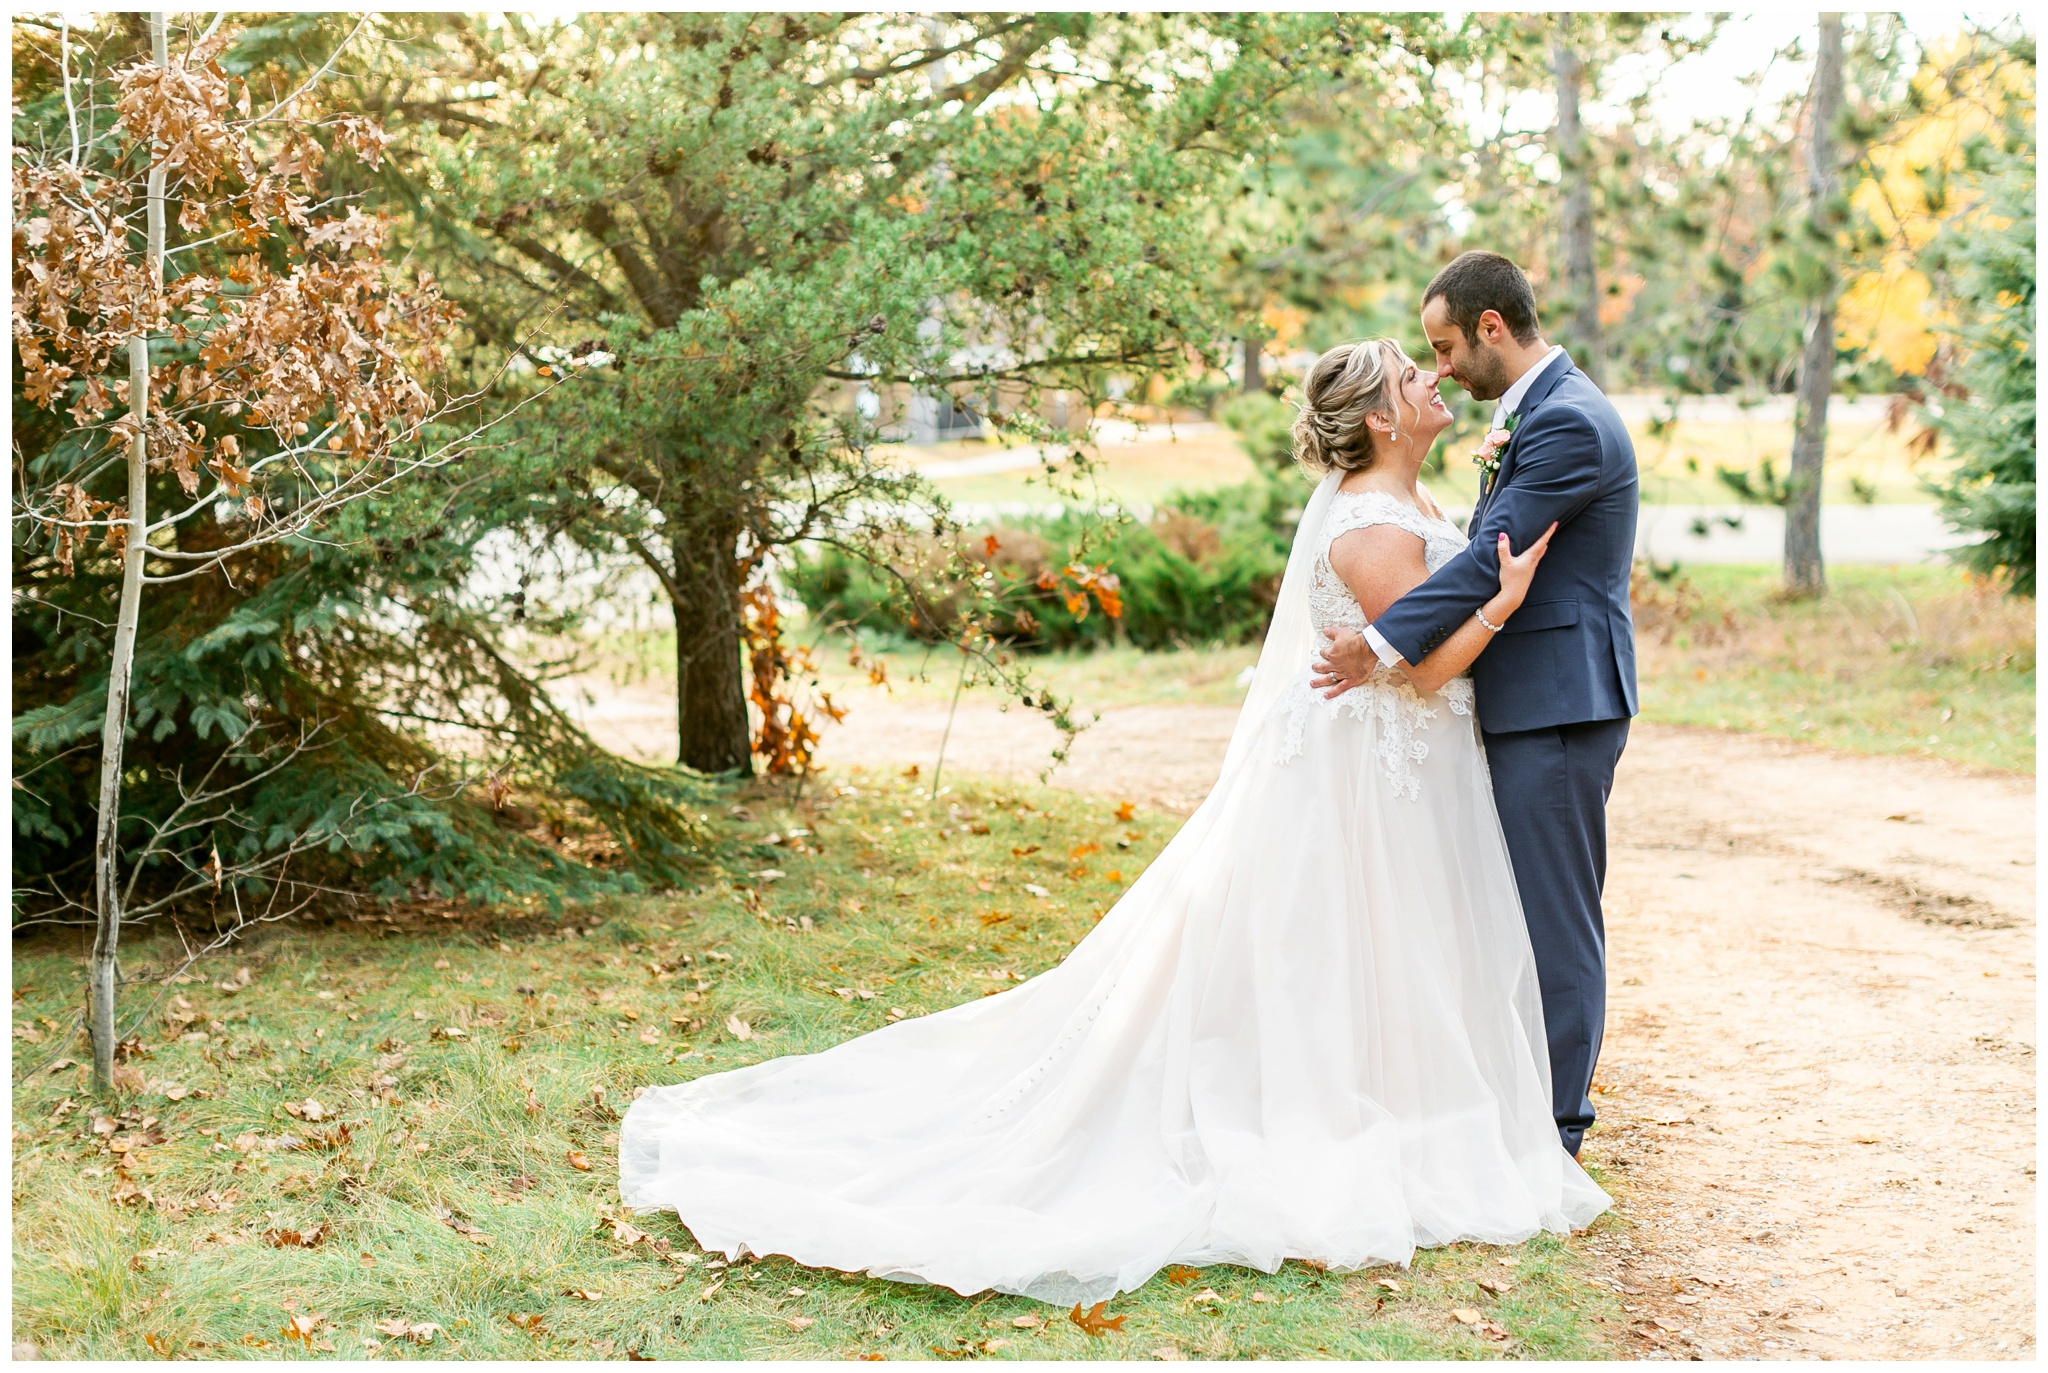 Shawano_County_park_Wedding_Caynay_Photo_Madison_Wi_2334.jpg